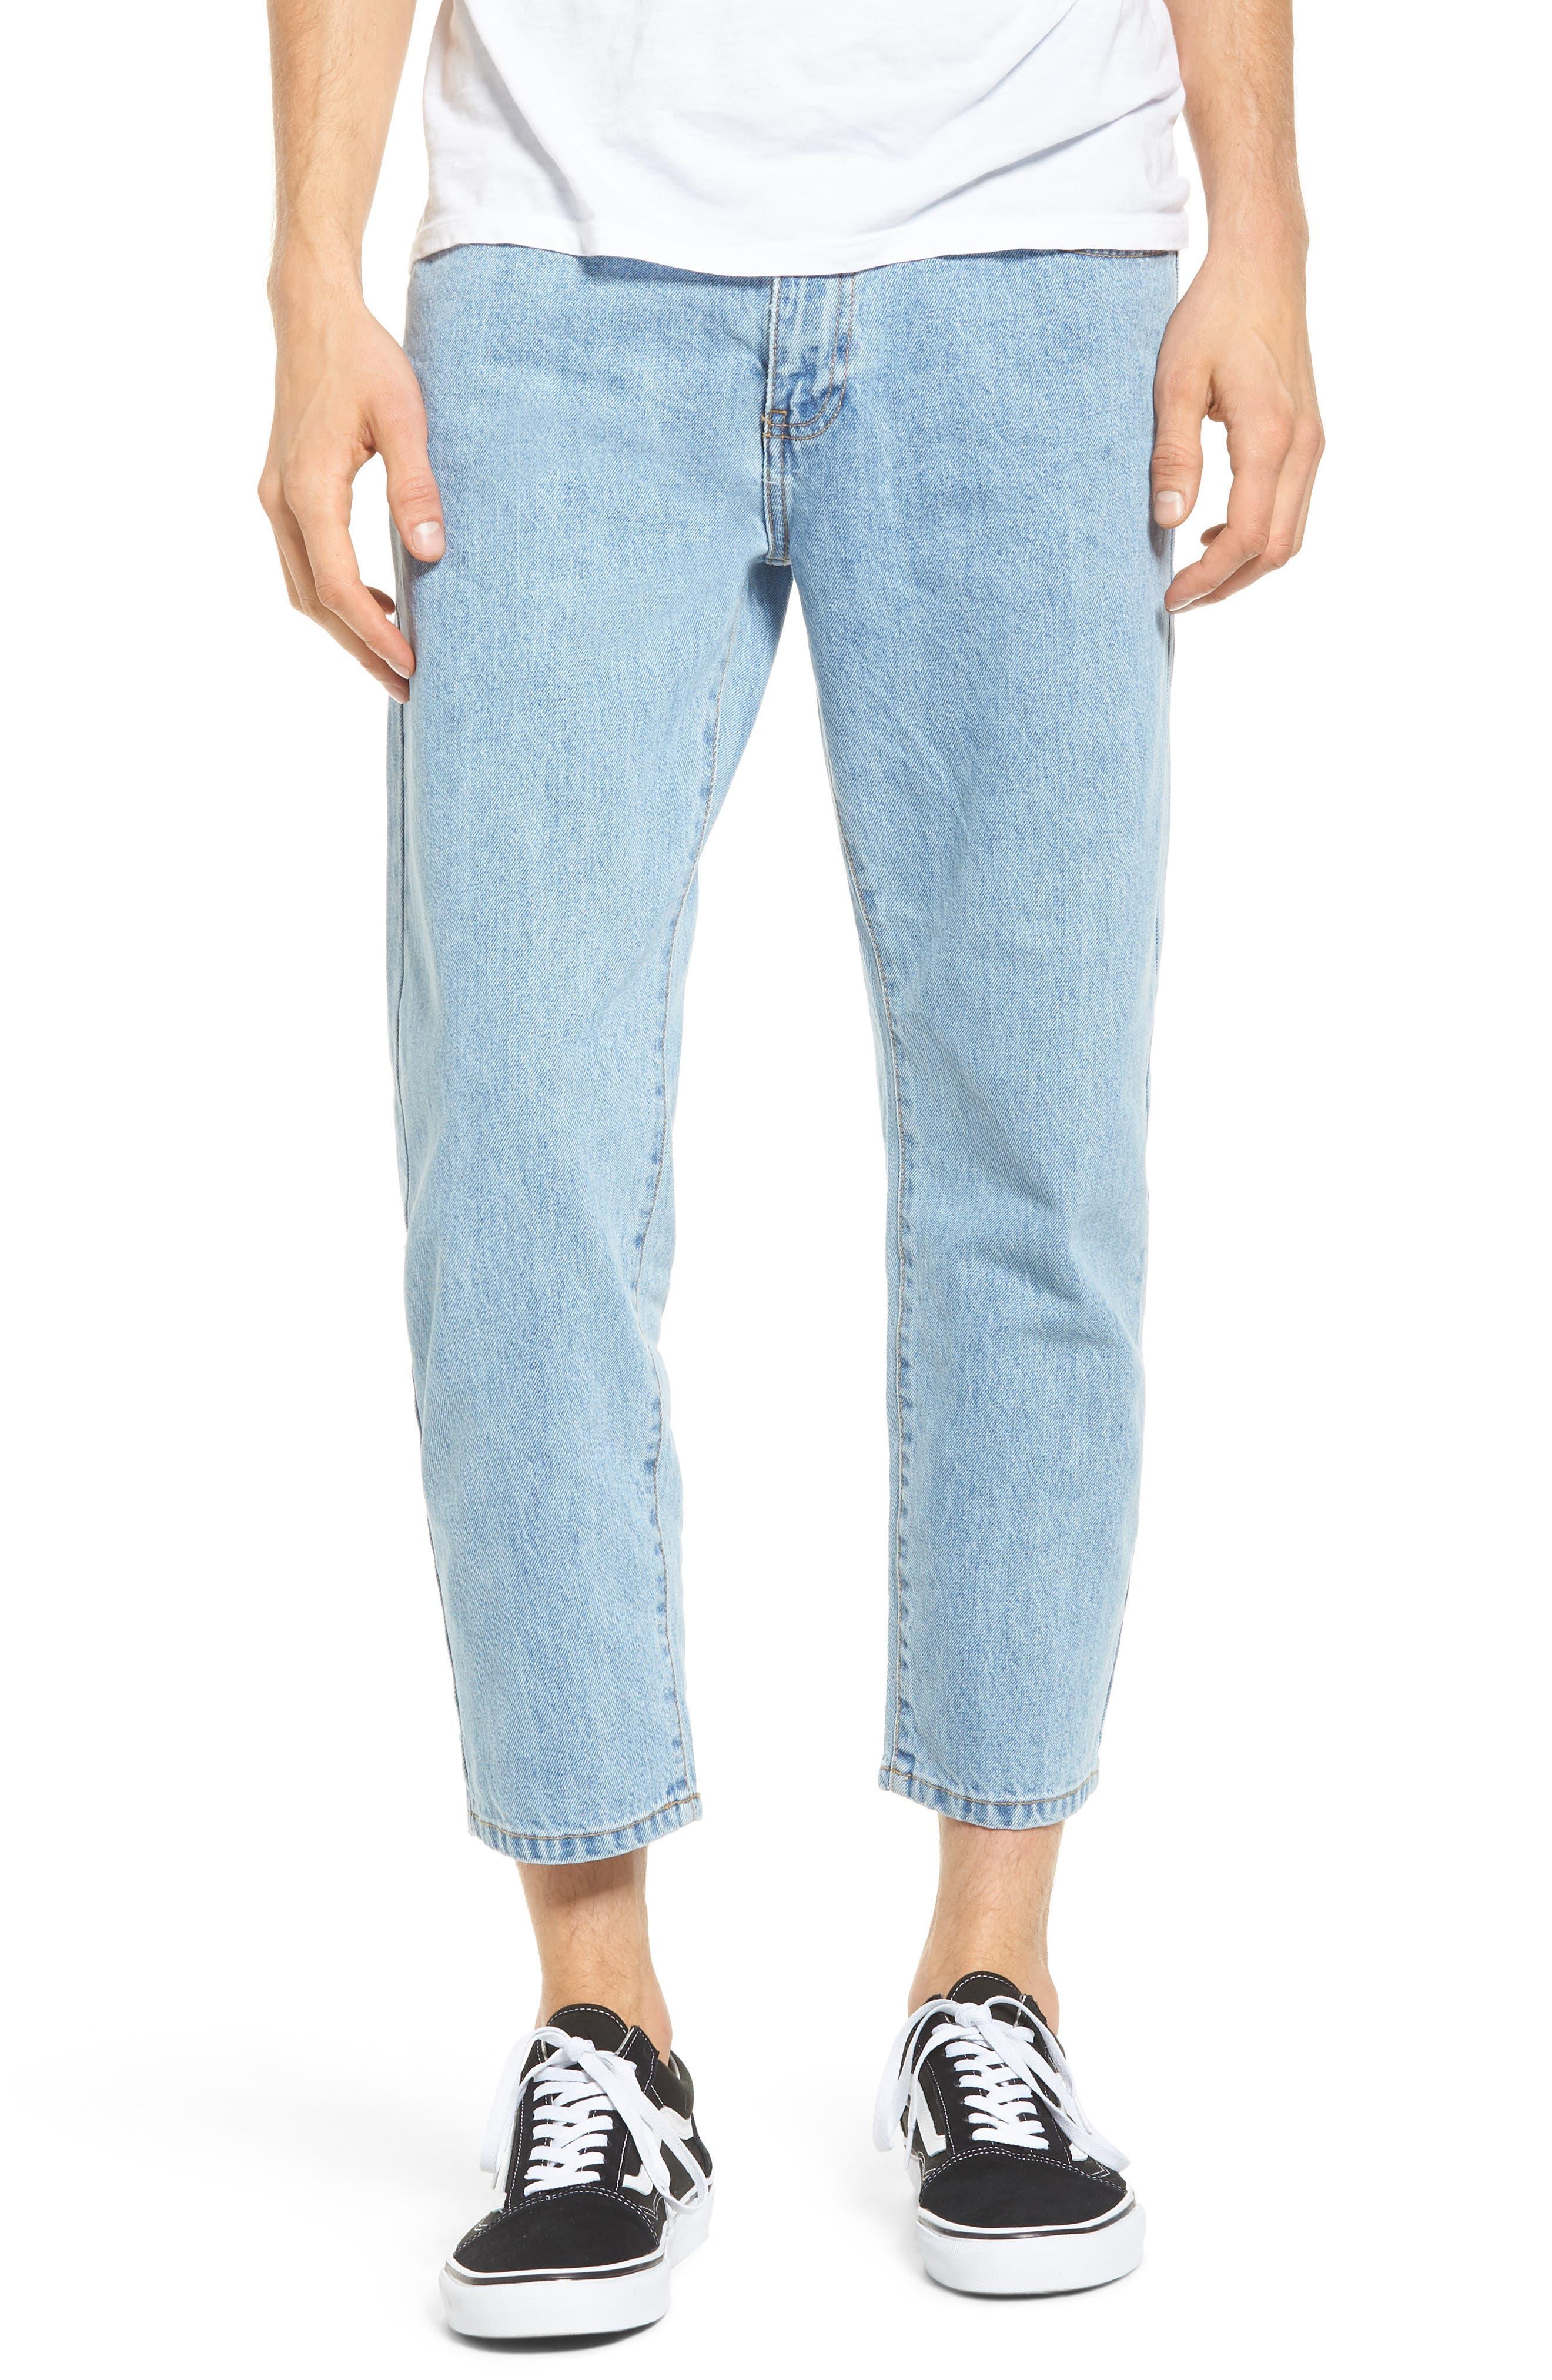 Dr. Denim Supply Co. Otis Straight Fit Jeans (Light Retro)